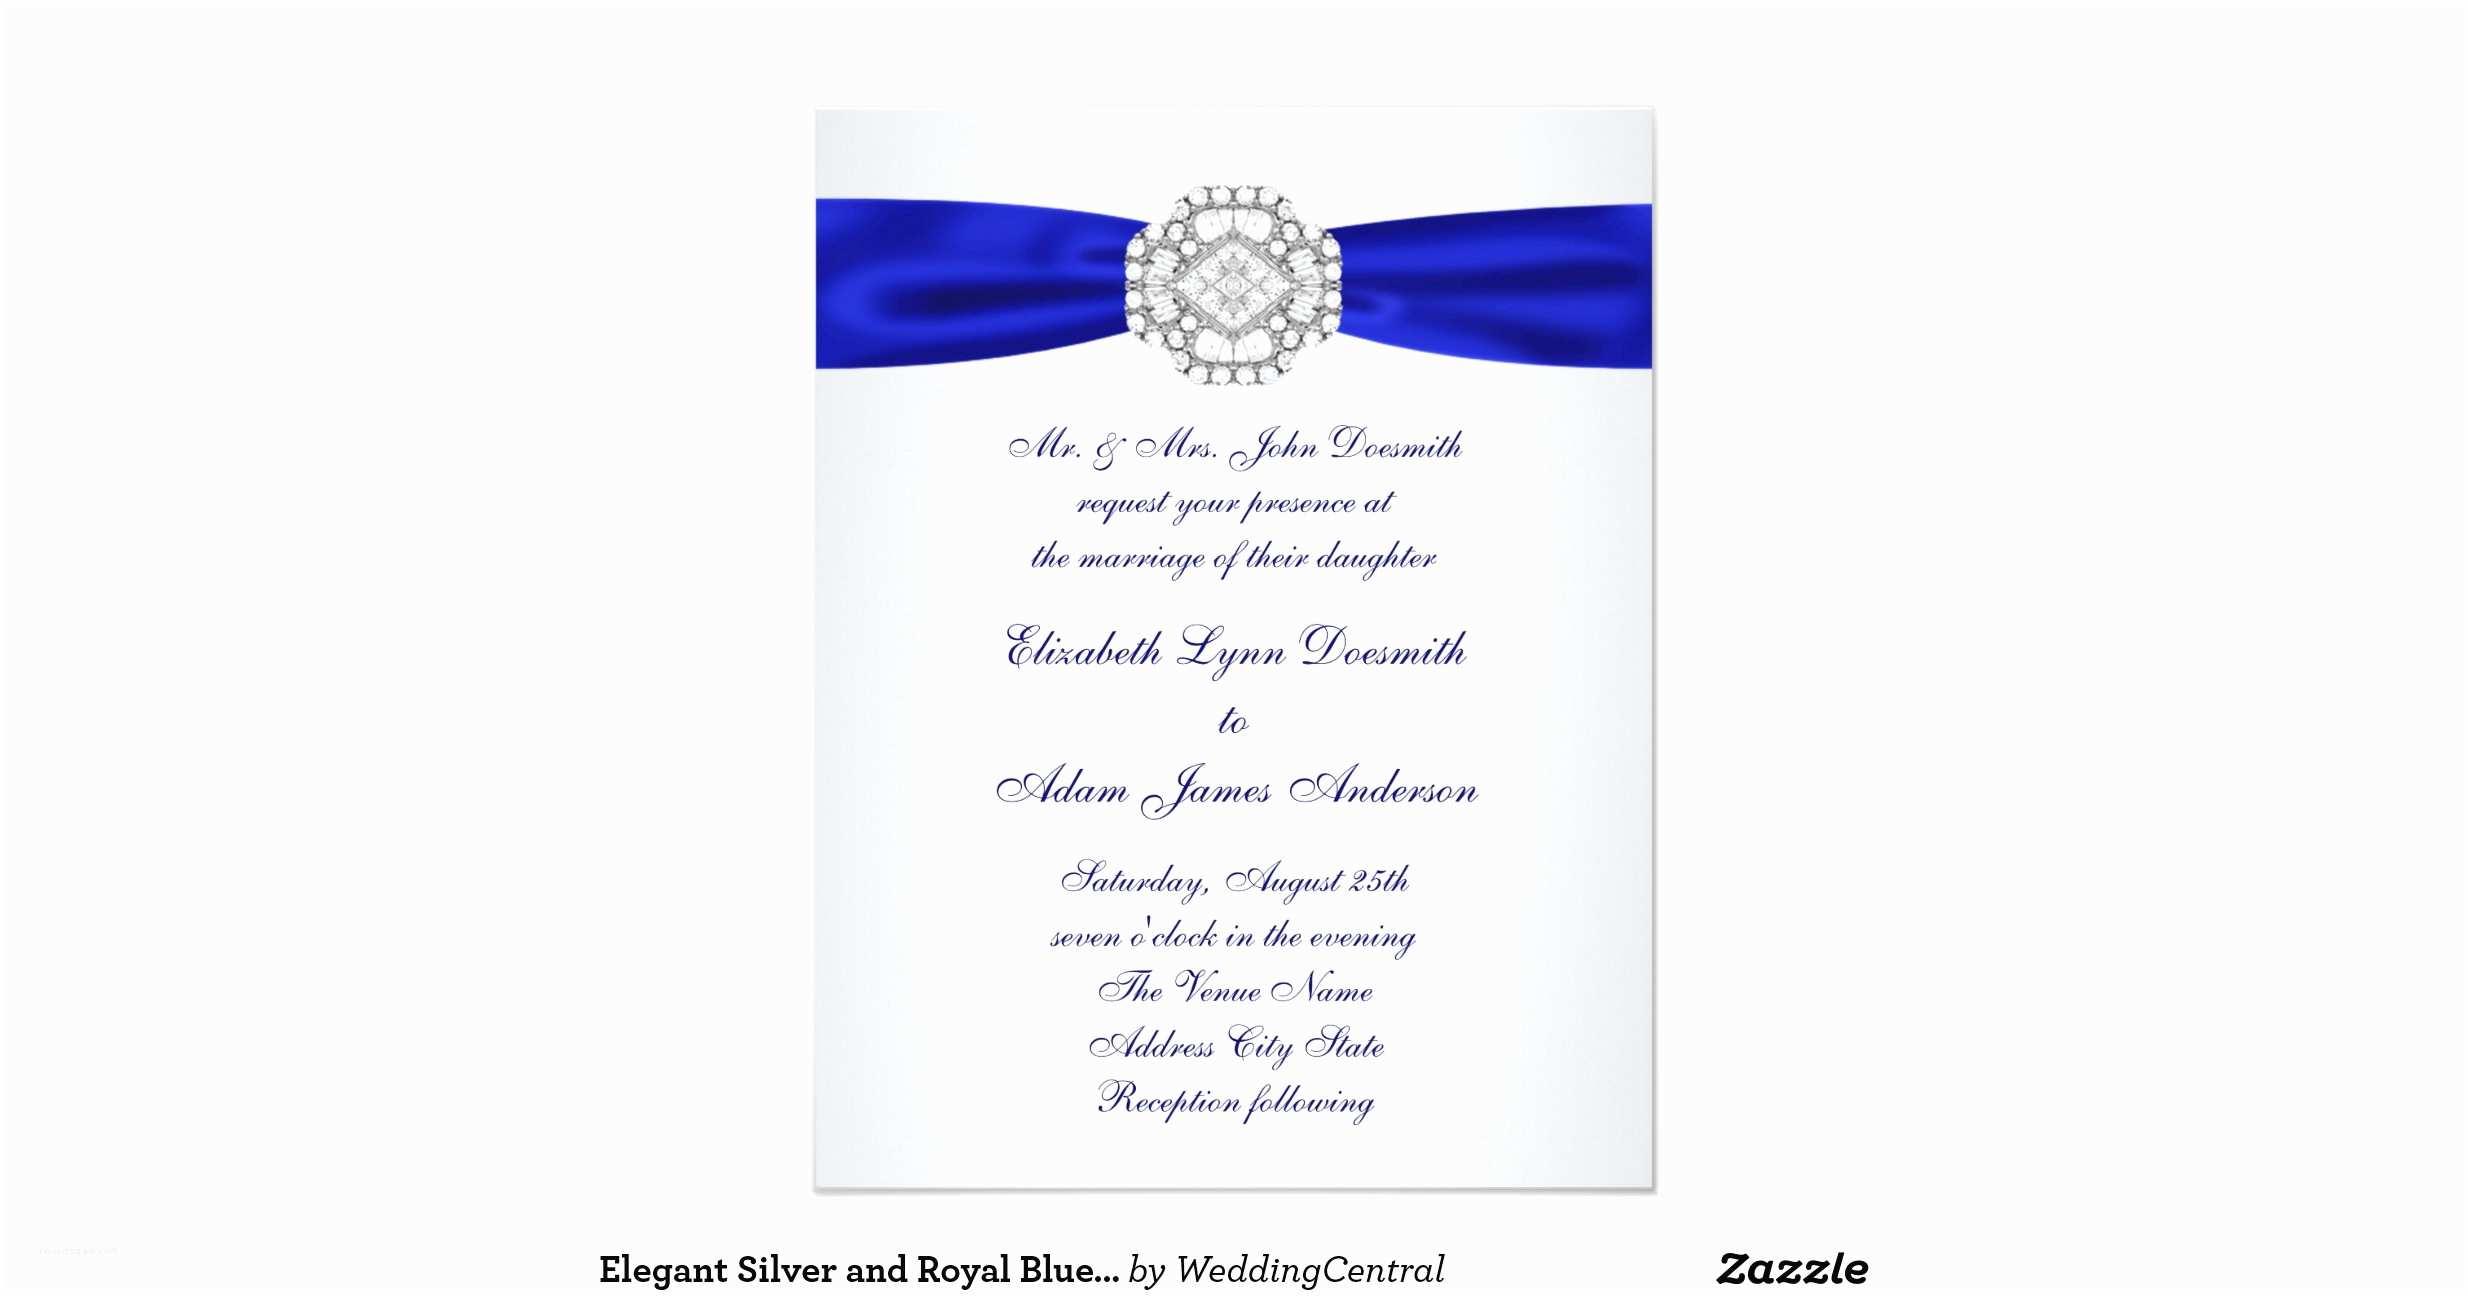 Elegant Silver Wedding Invitations Elegant Silver and Royal Blue Wedding Invitations